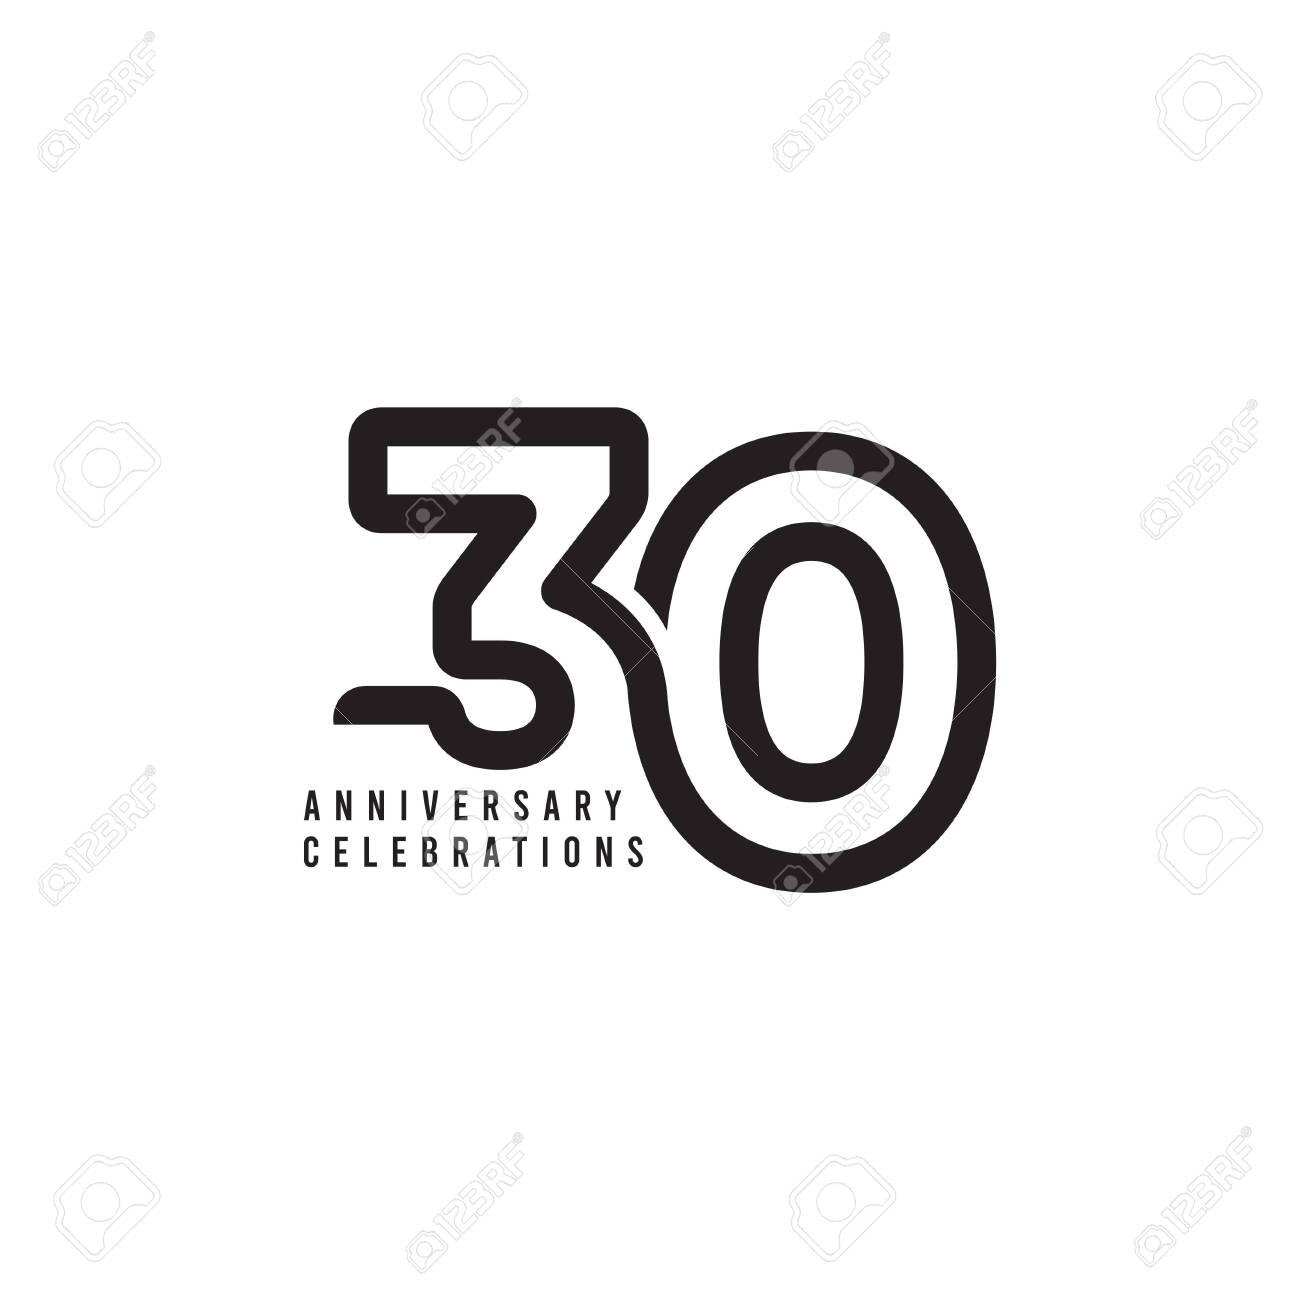 30 Years Anniversary Celebrations Template Design Illustration - 136734859